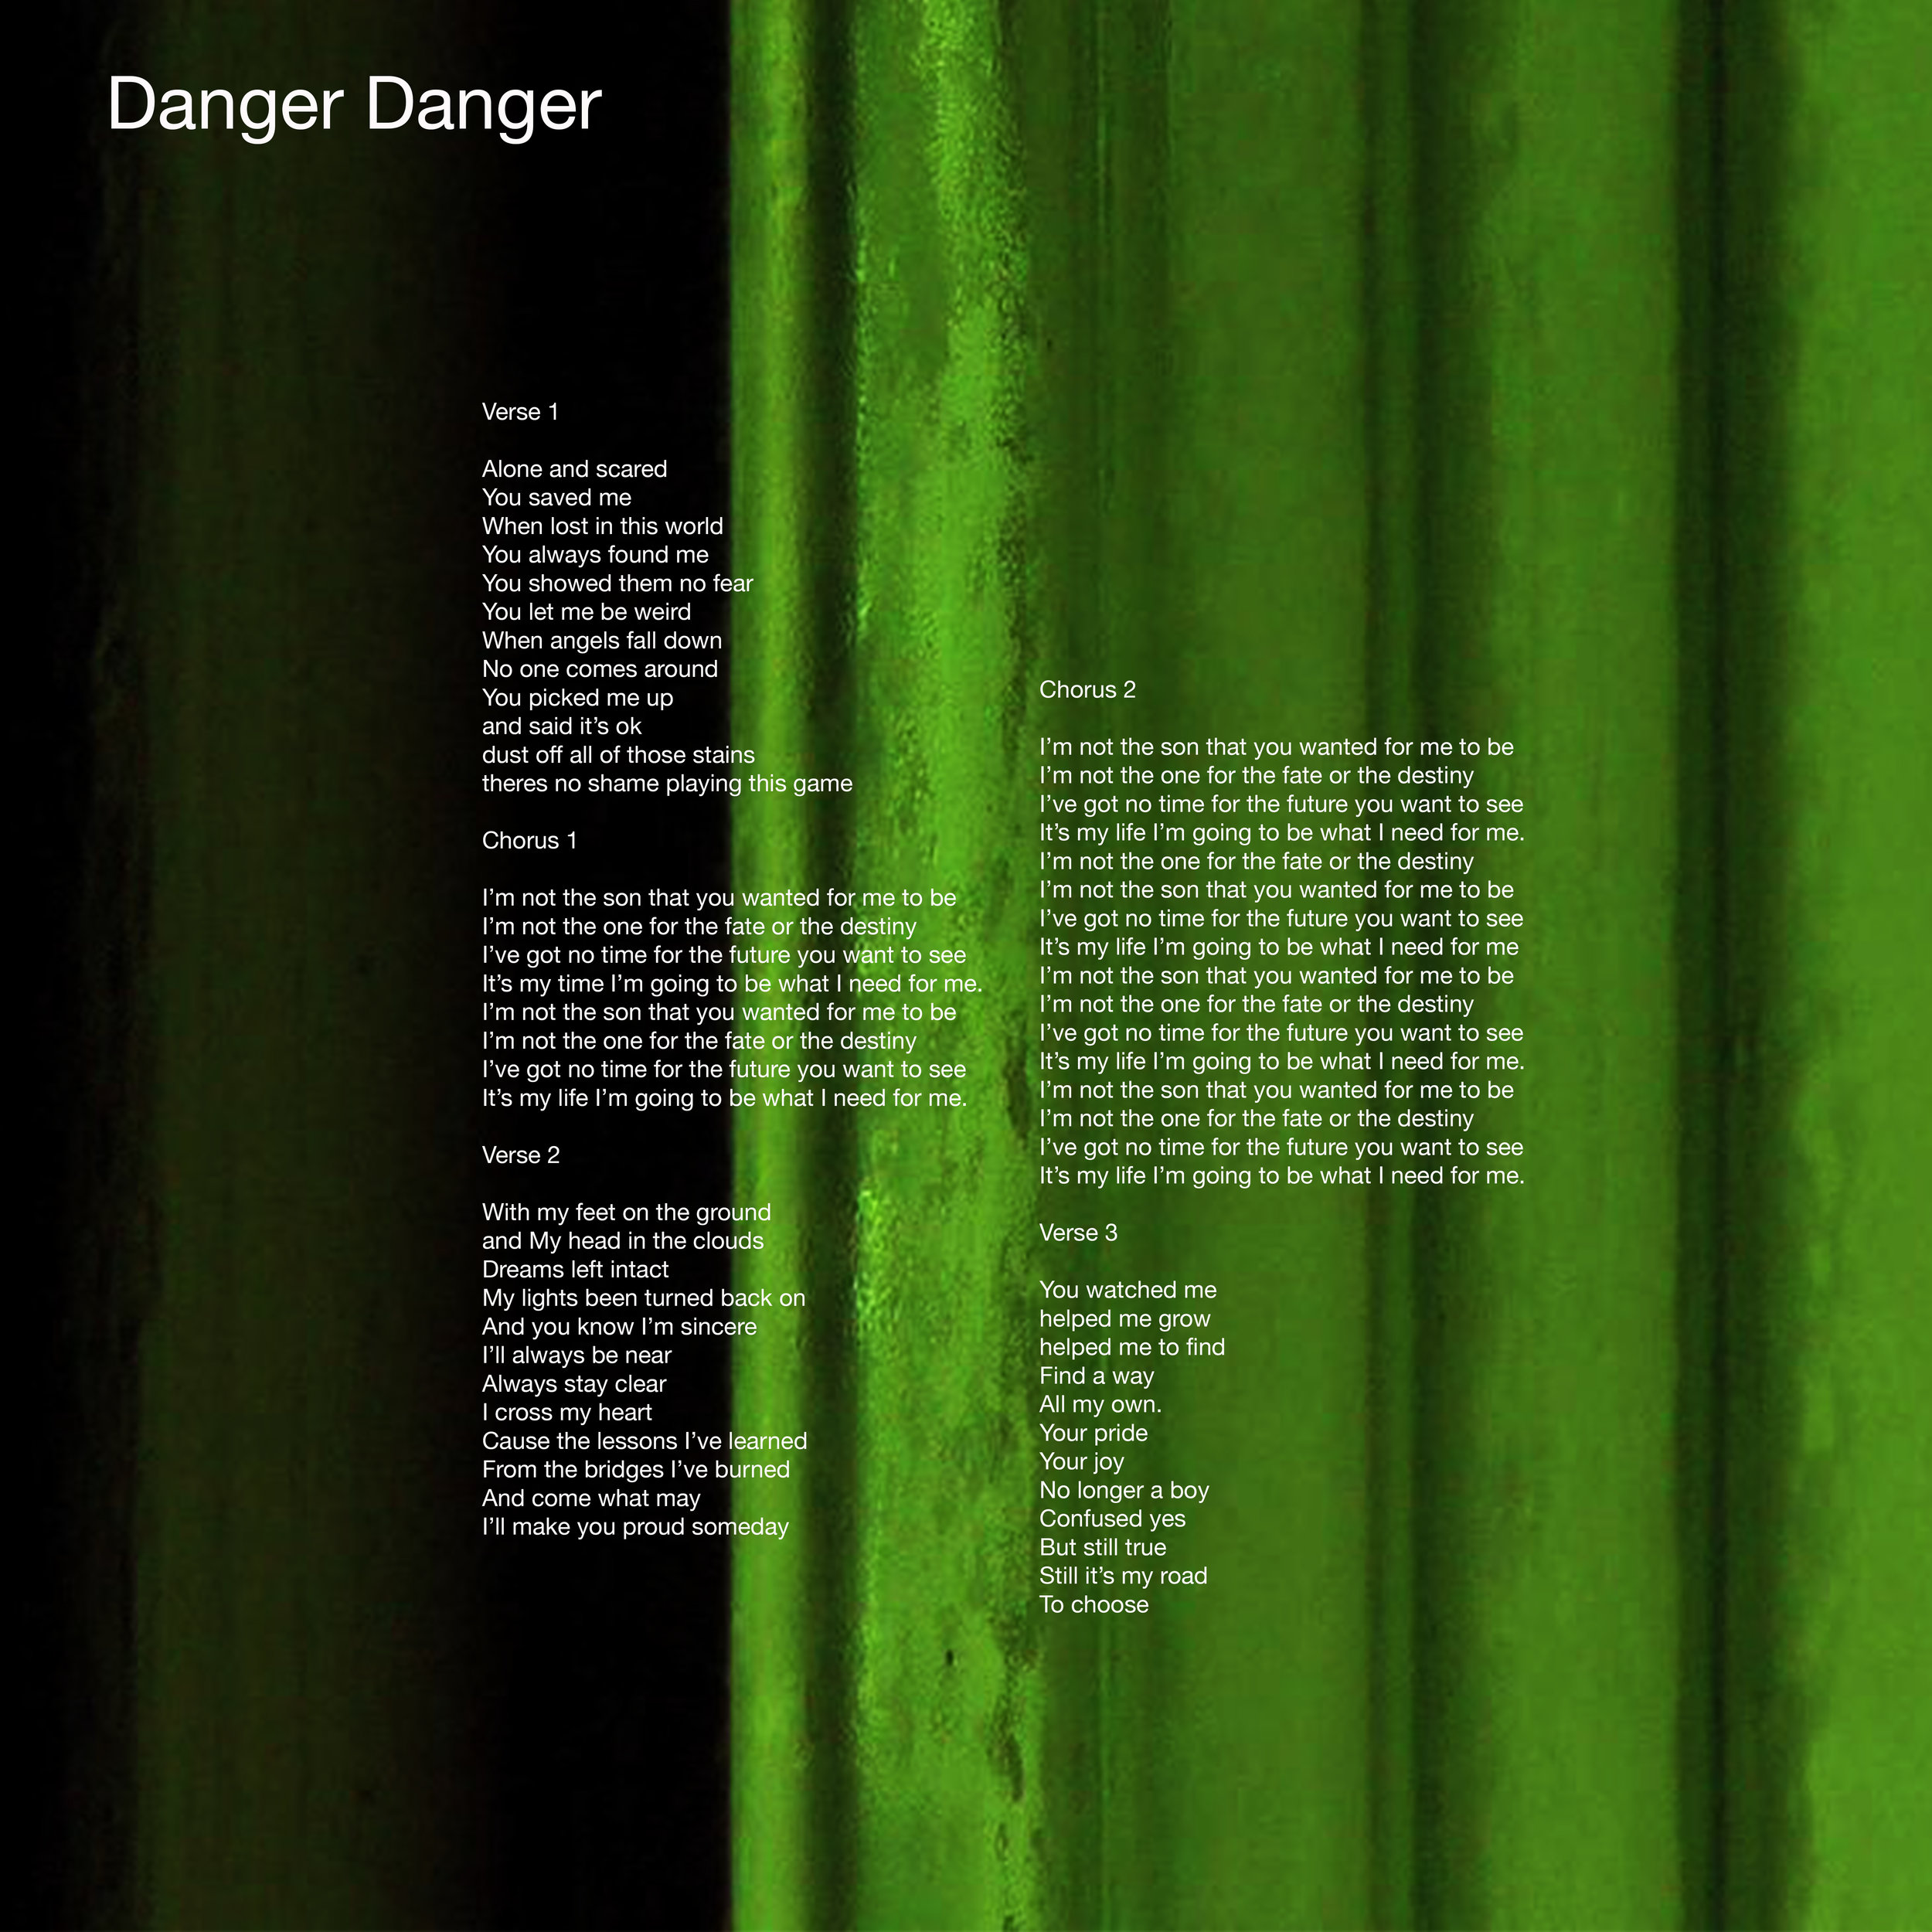 DangerDangerMTheoryLyricArtDLX.jpg